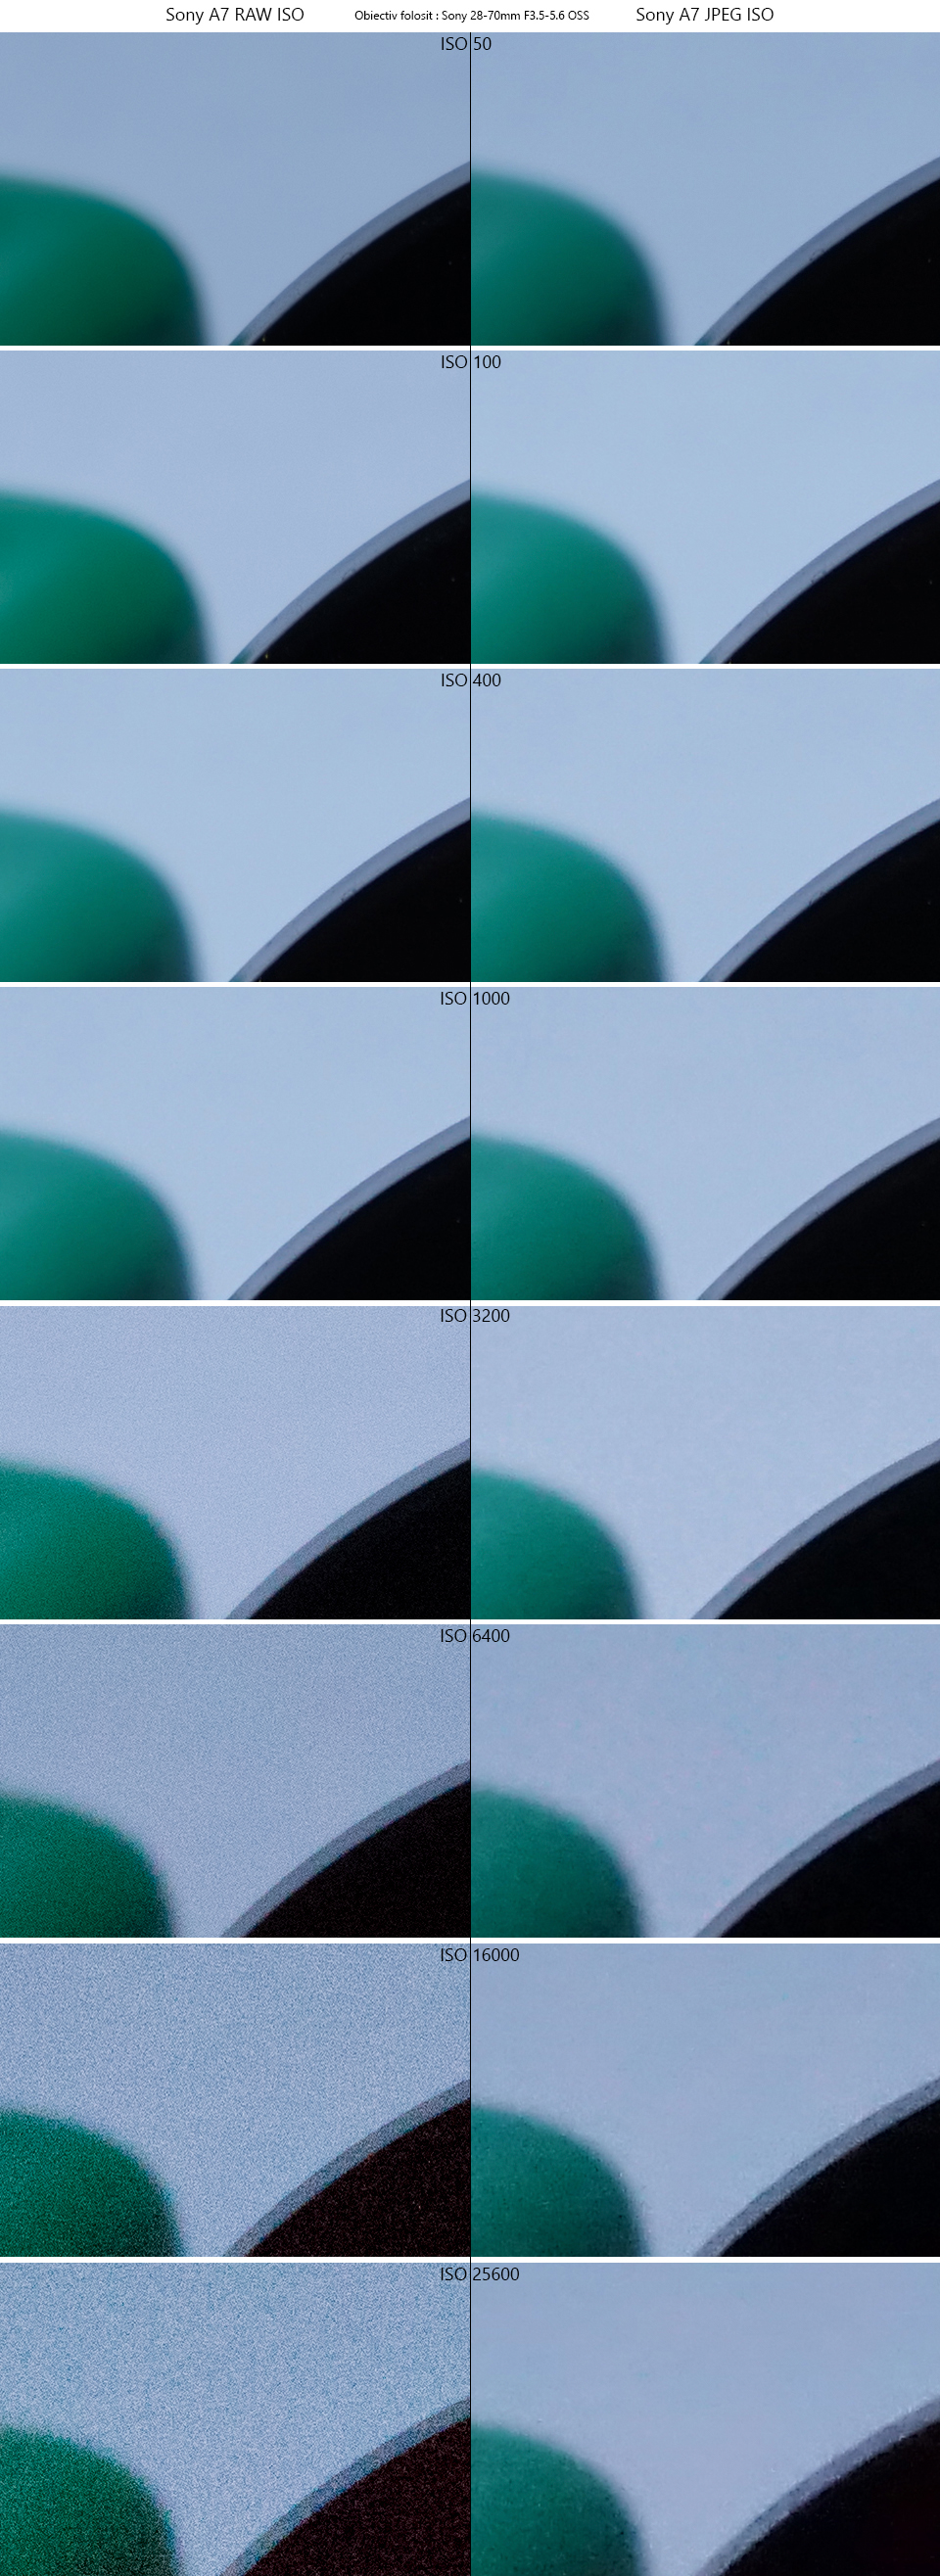 Sony-A7-ISO-Test-RAW-vs-JPEG